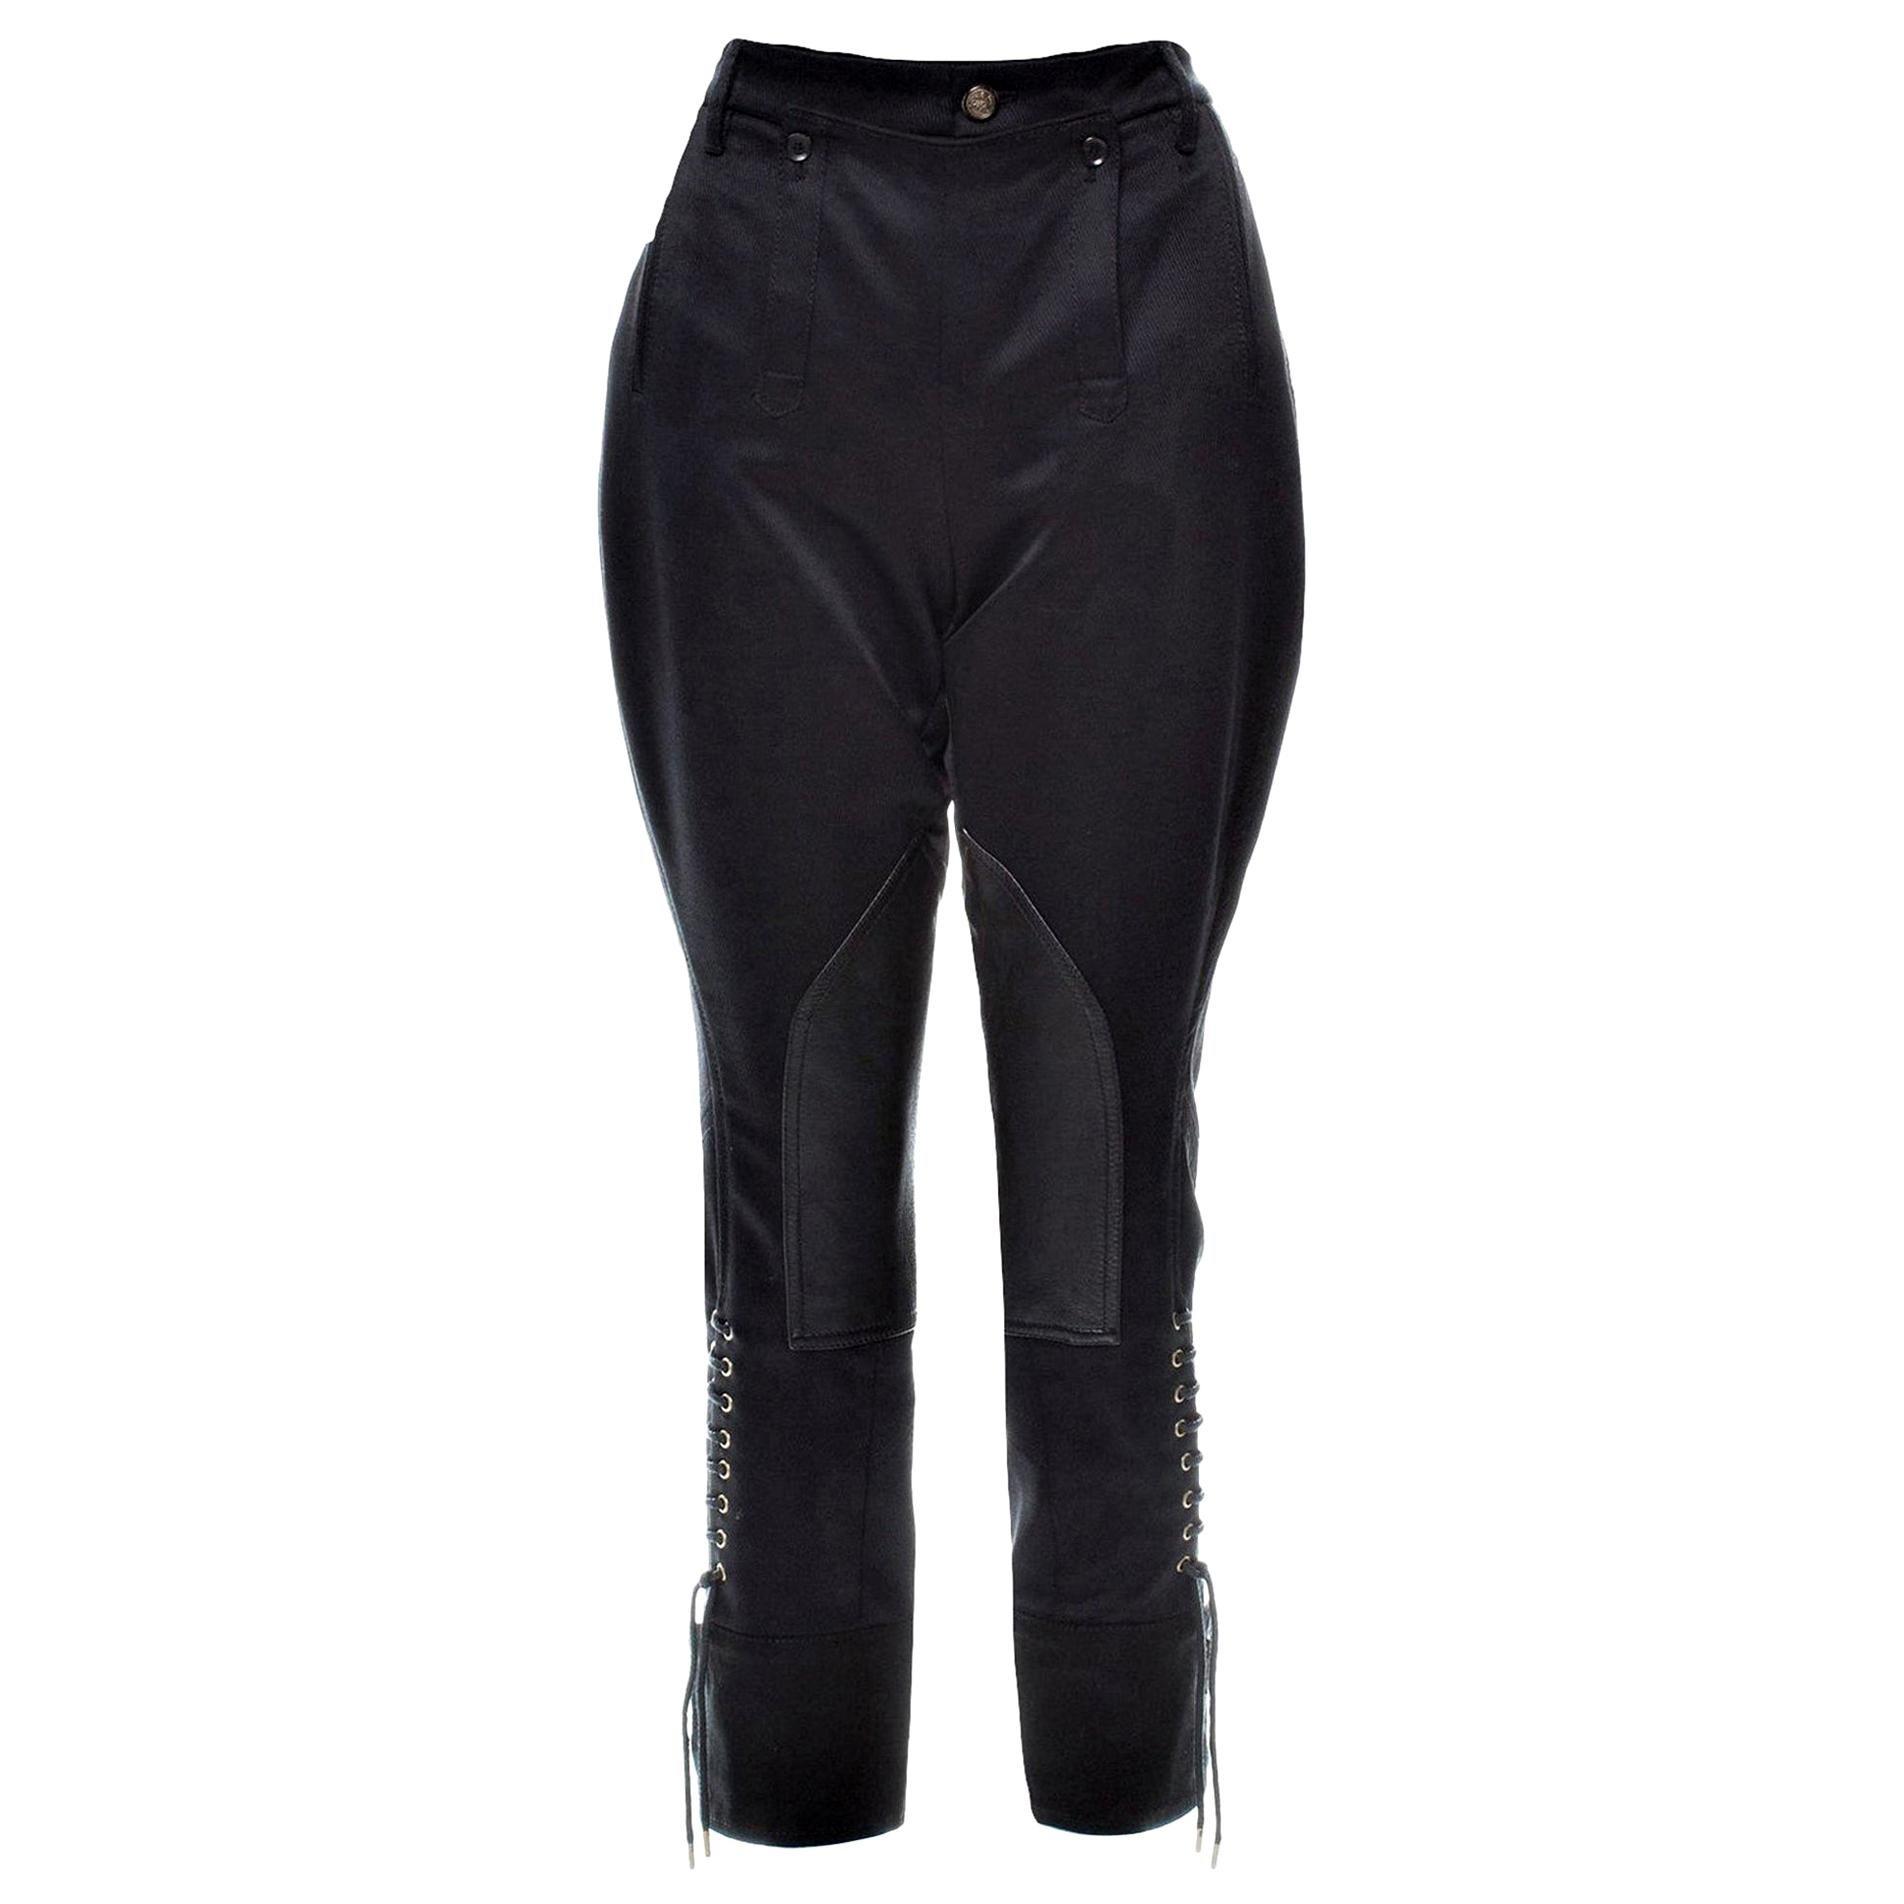 New Gucci Black Runway Pants F/W 2008 Sz 42 With Tags $1725